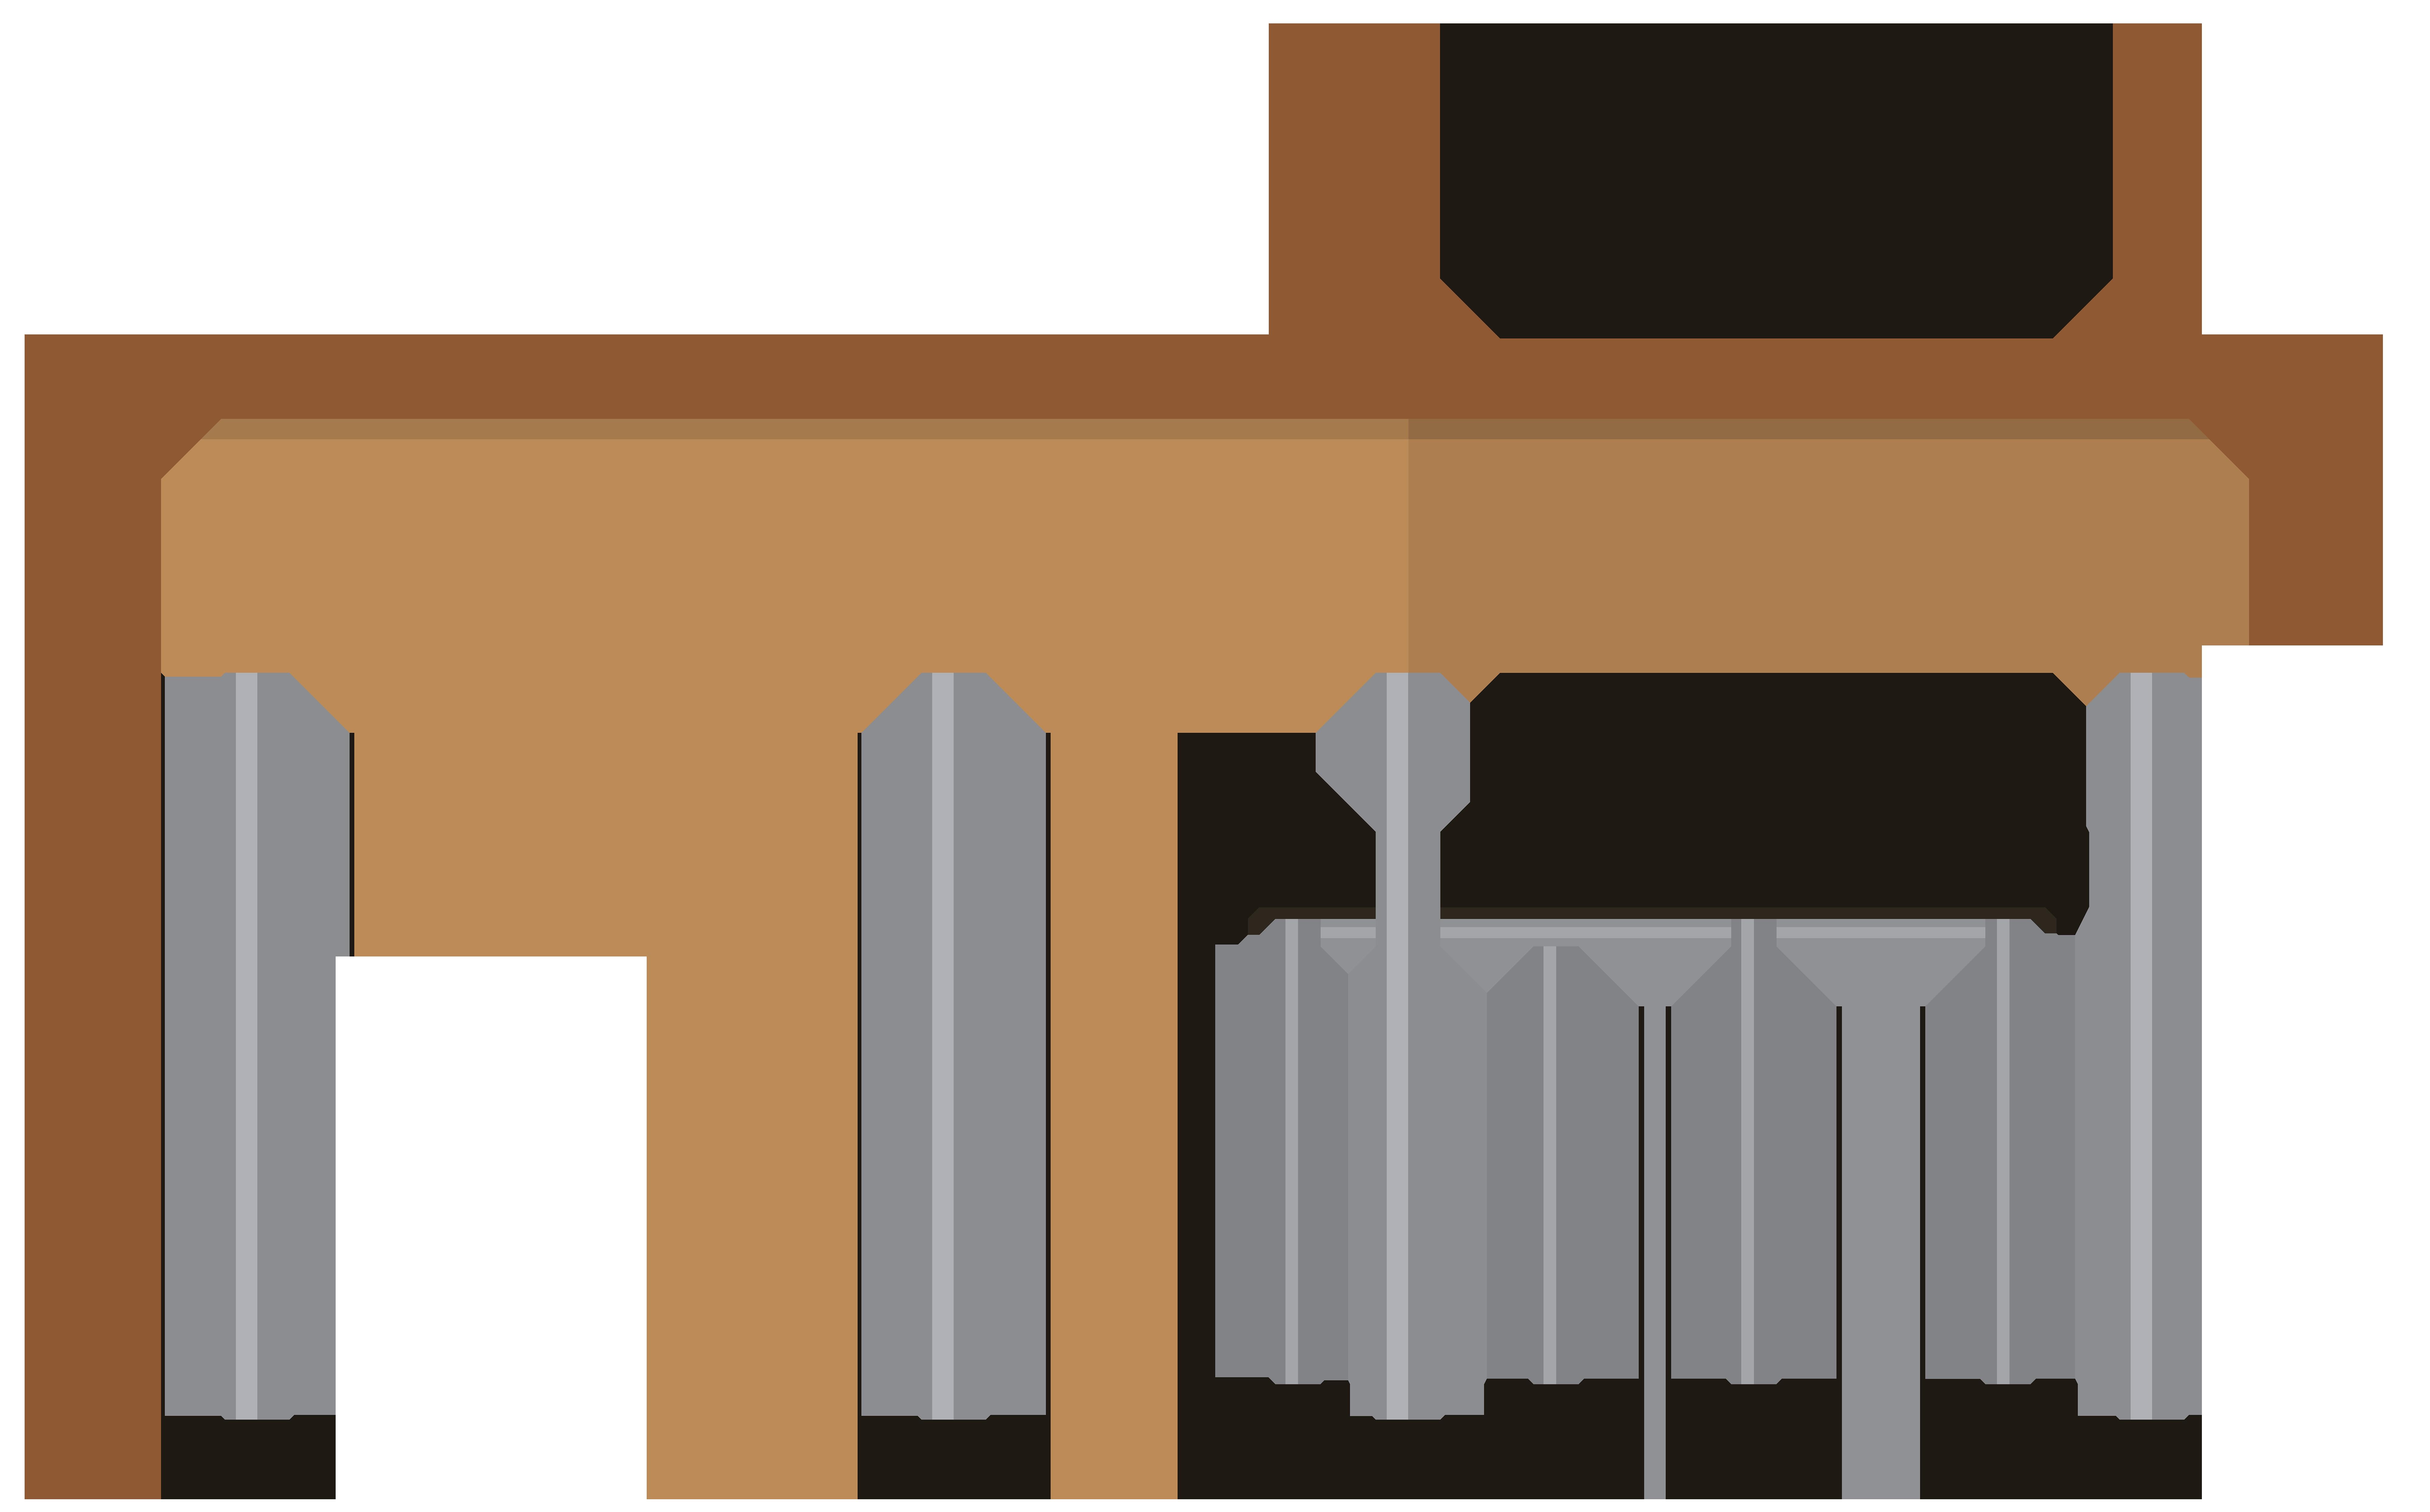 School desks clipart png black and white download School Desks Clip Art PNG Image | Gallery Yopriceville - High ... png black and white download